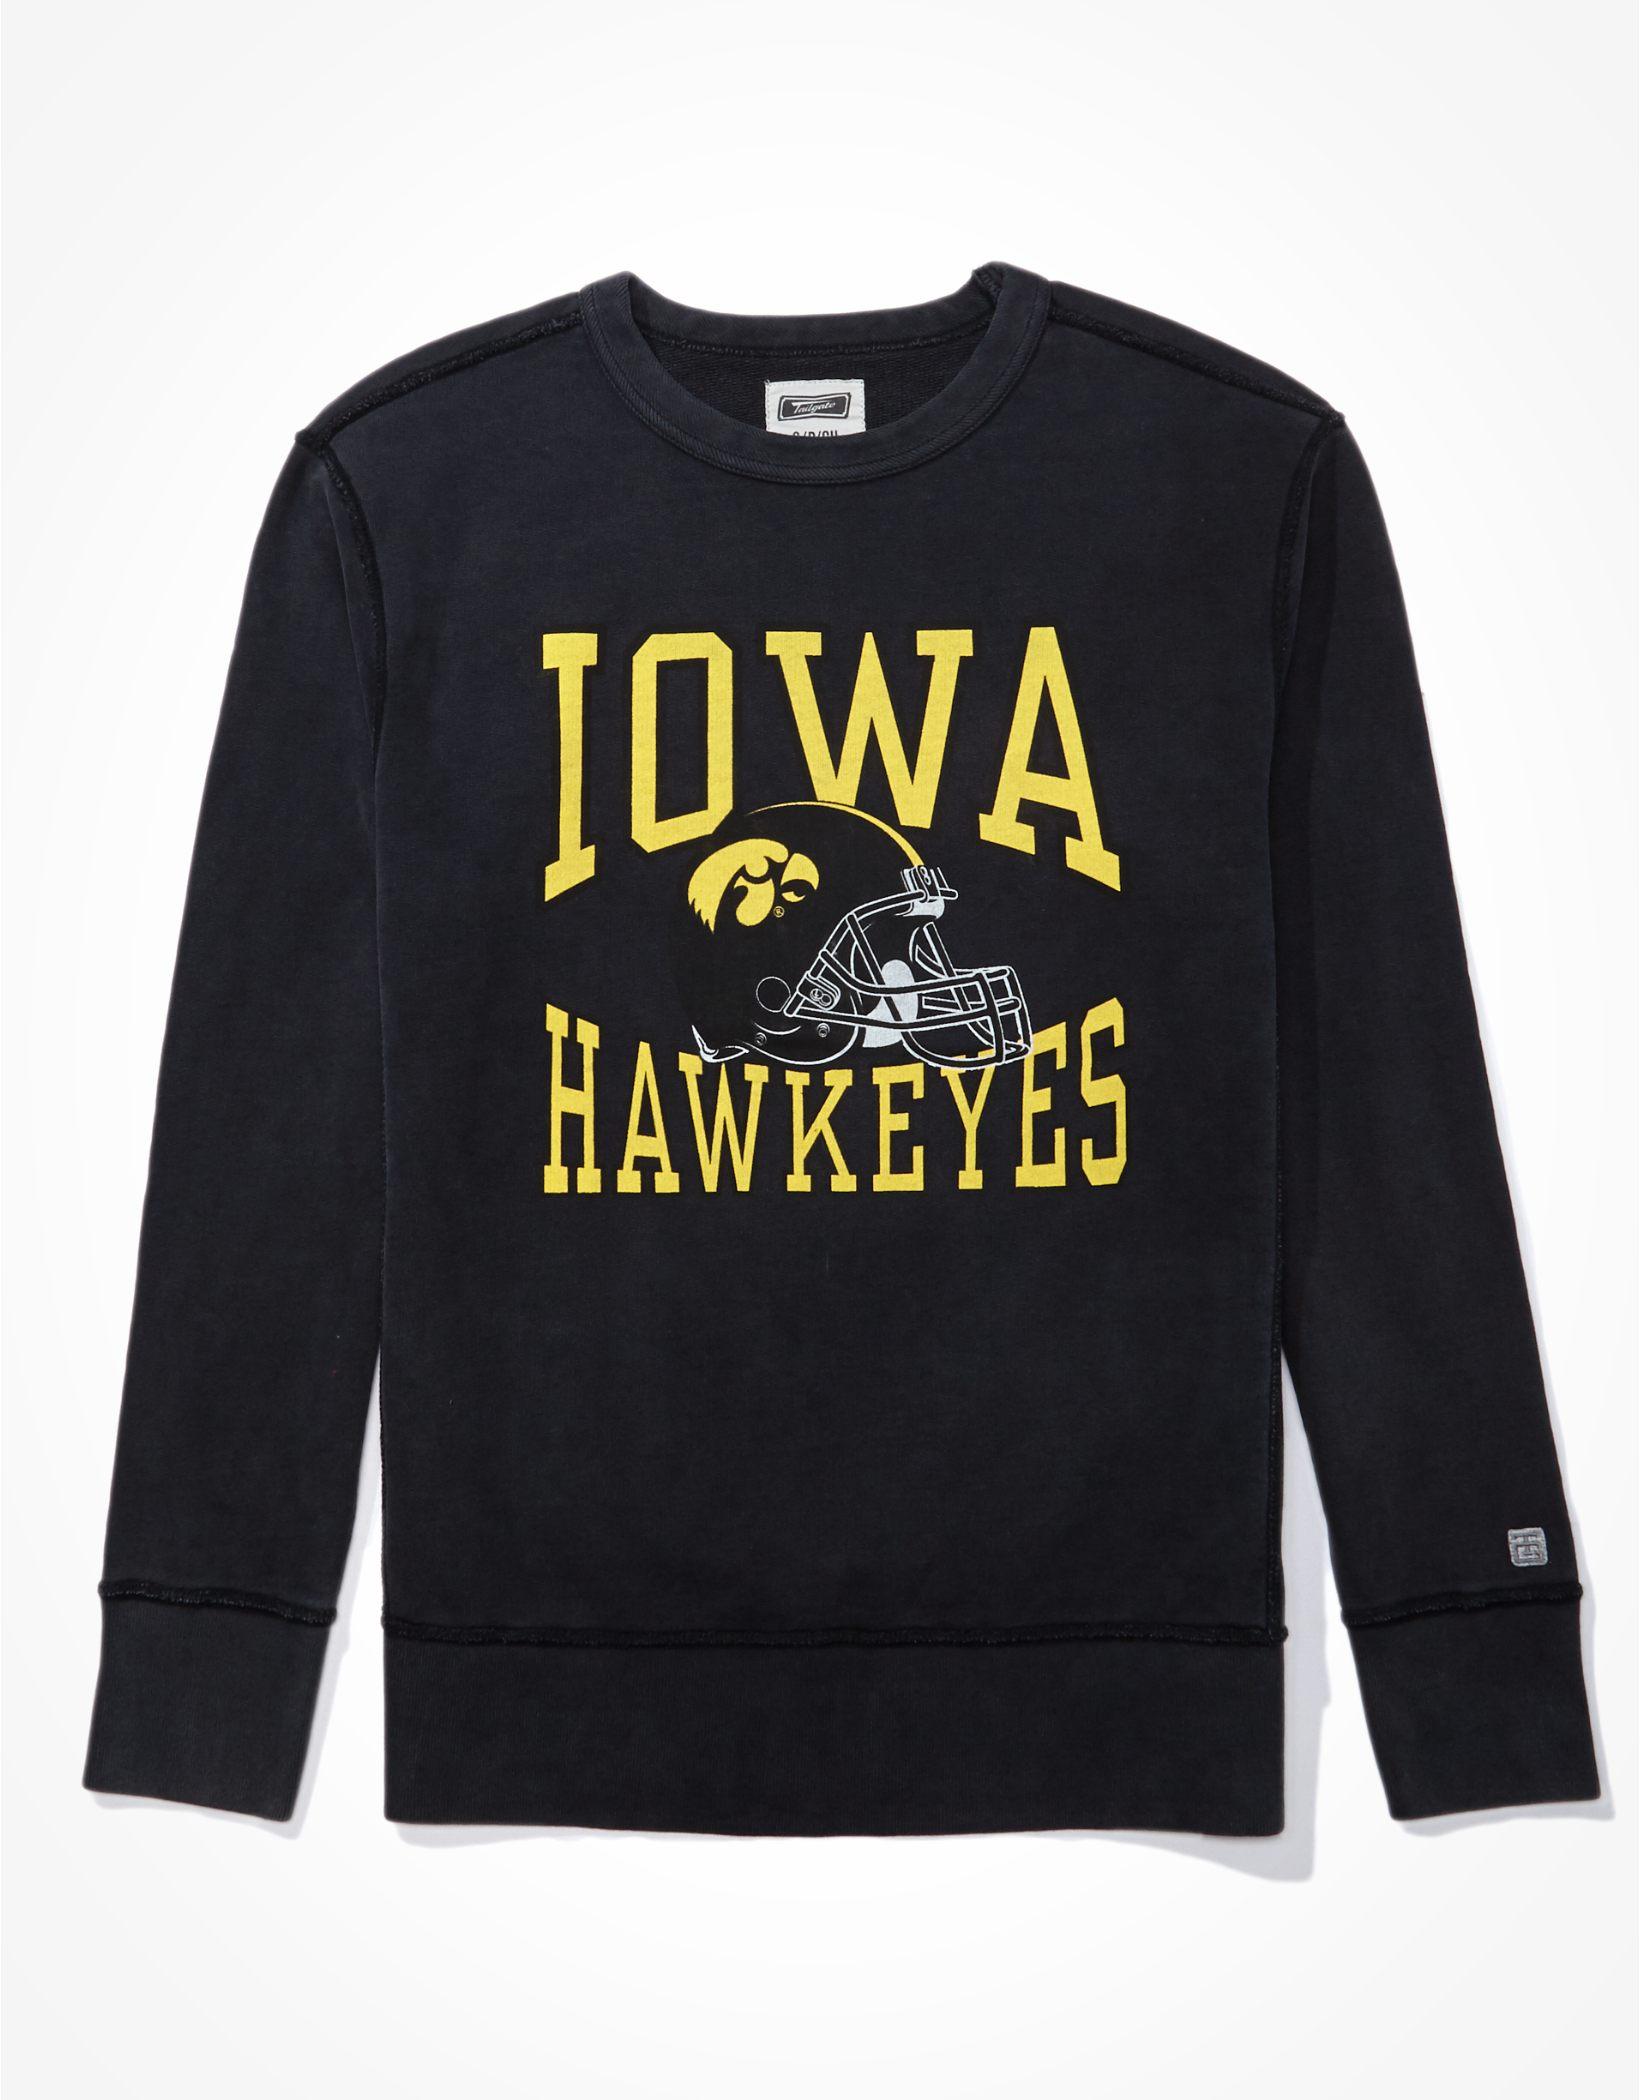 Tailgate Men's Iowa Hawkeyes Crewneck Sweatshirt